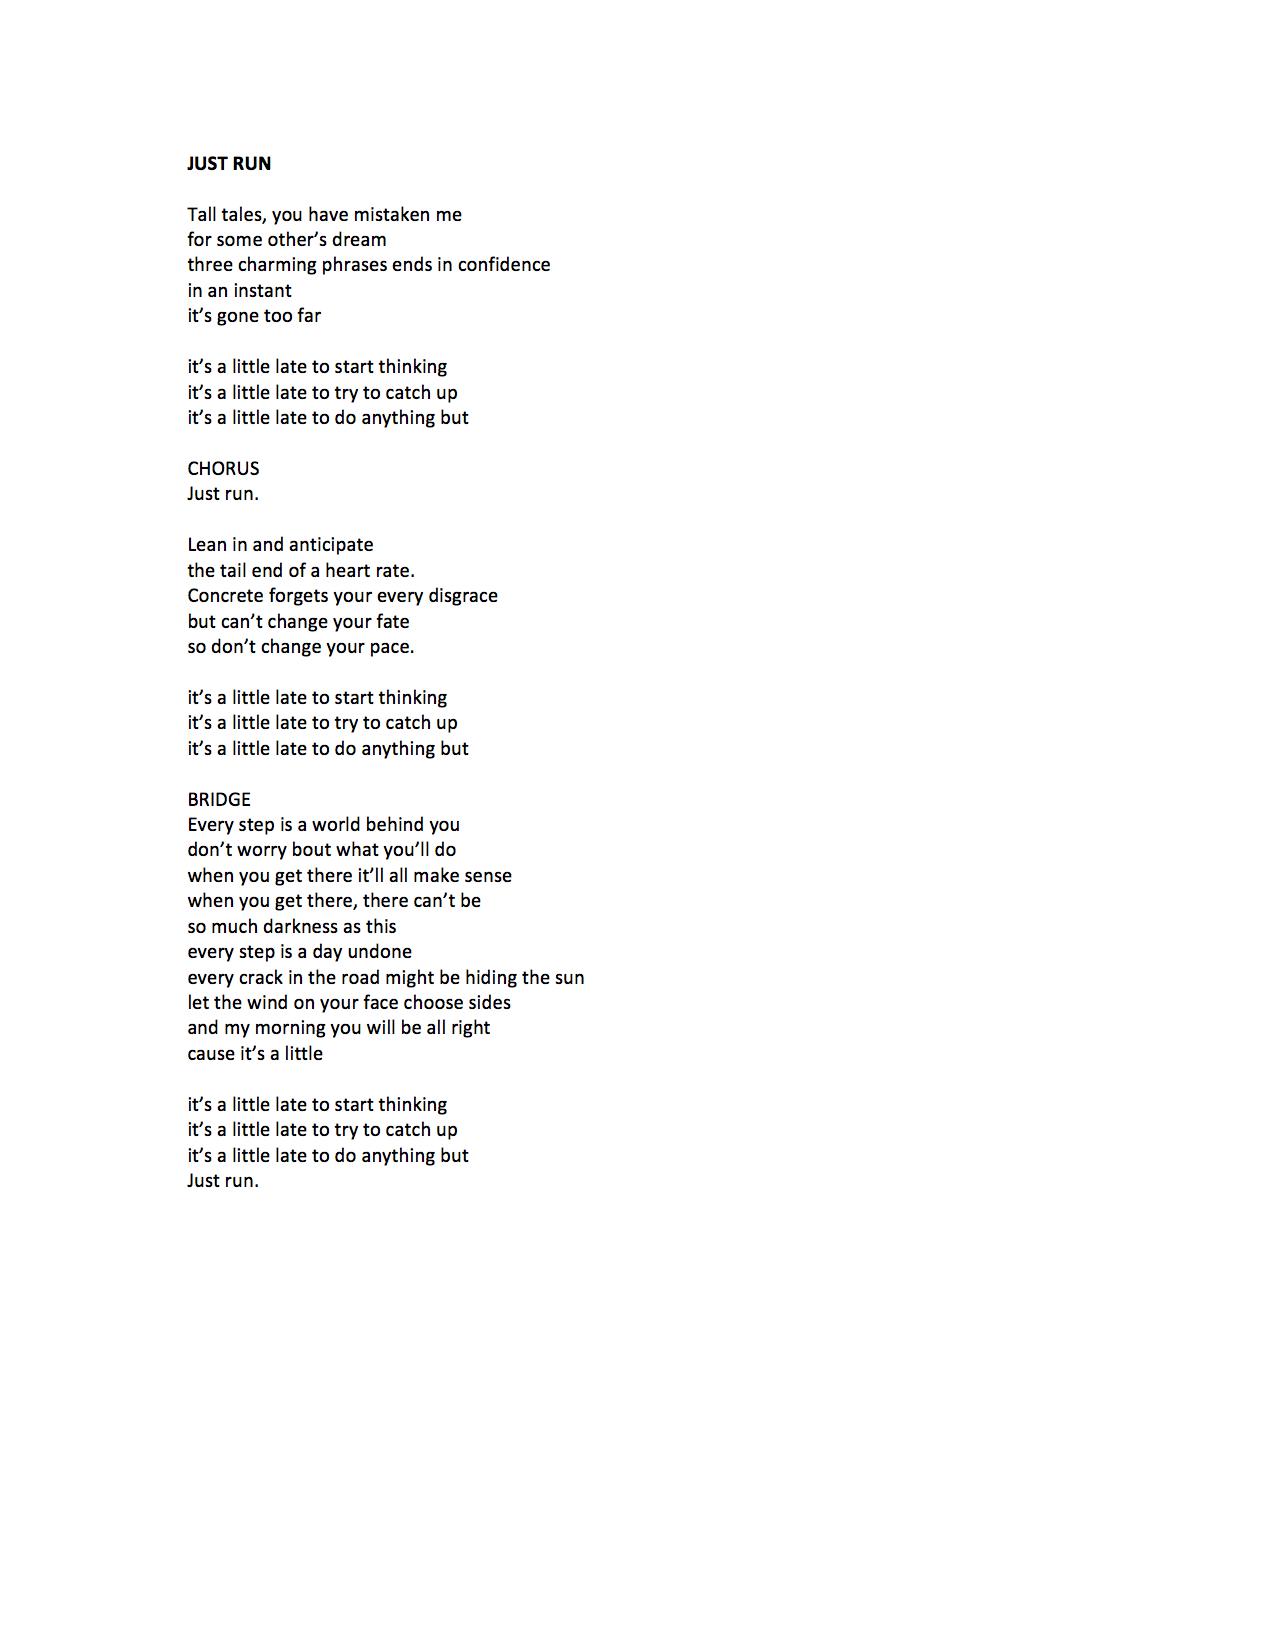 Just Run Lyrics.jpg